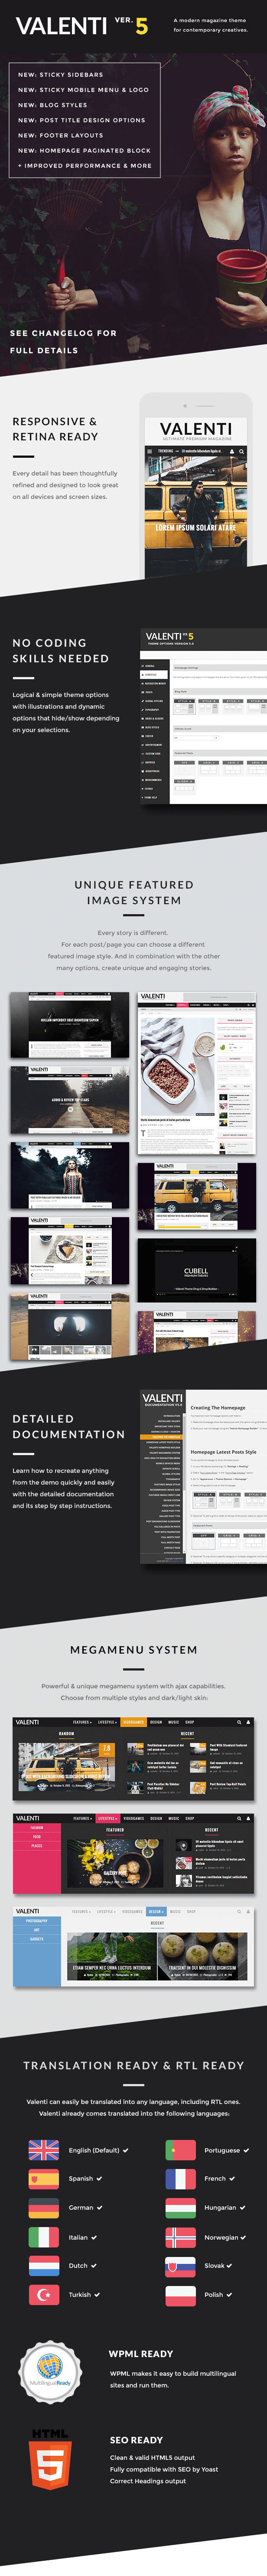 5 01 - Valenti - WordPress HD Review Magazine News Theme